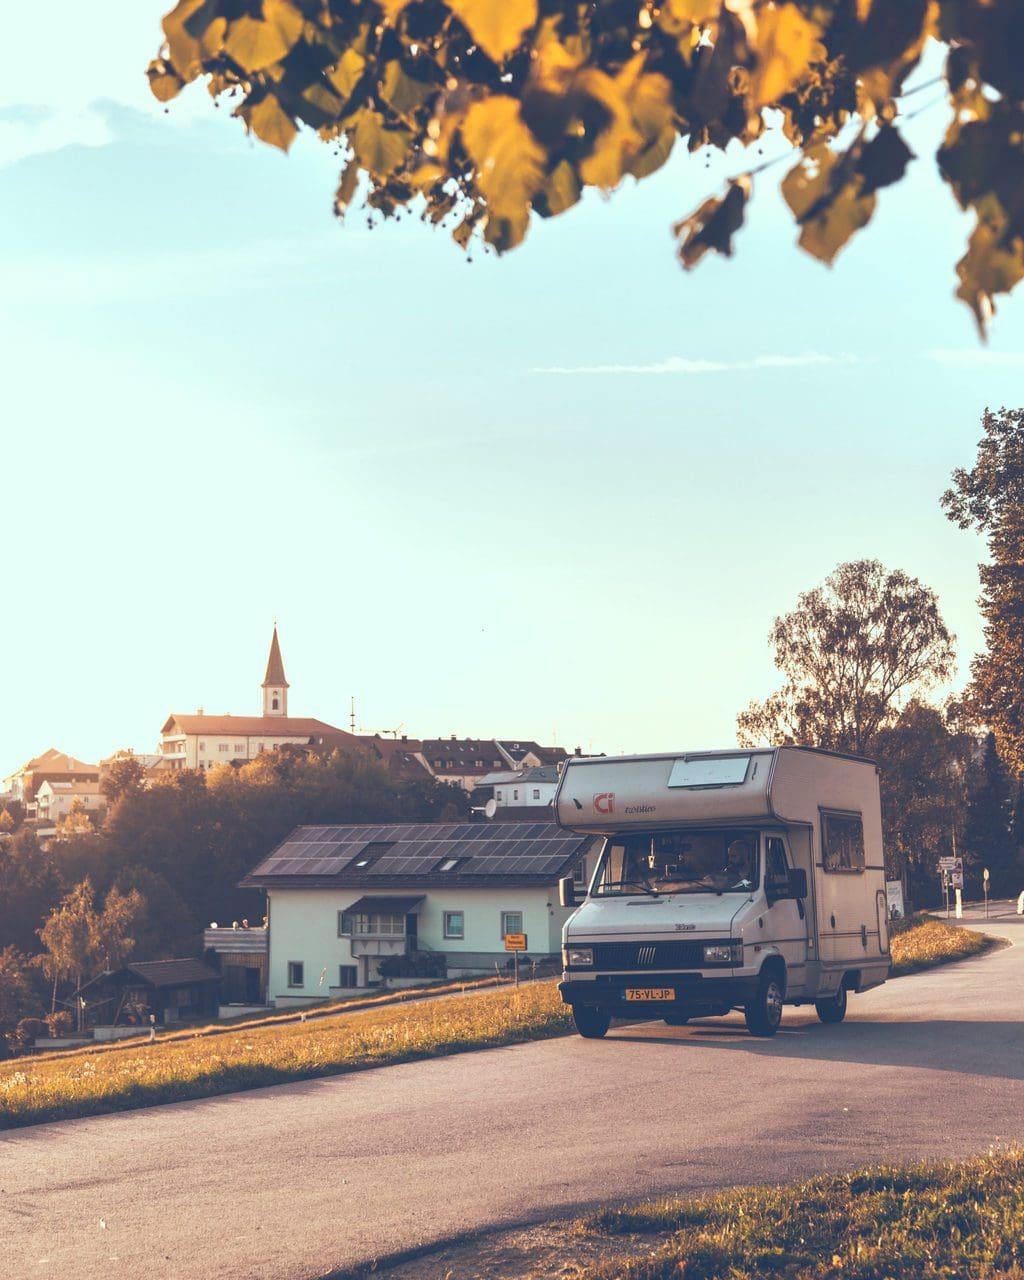 Kamperen in Duitsland als beginneling